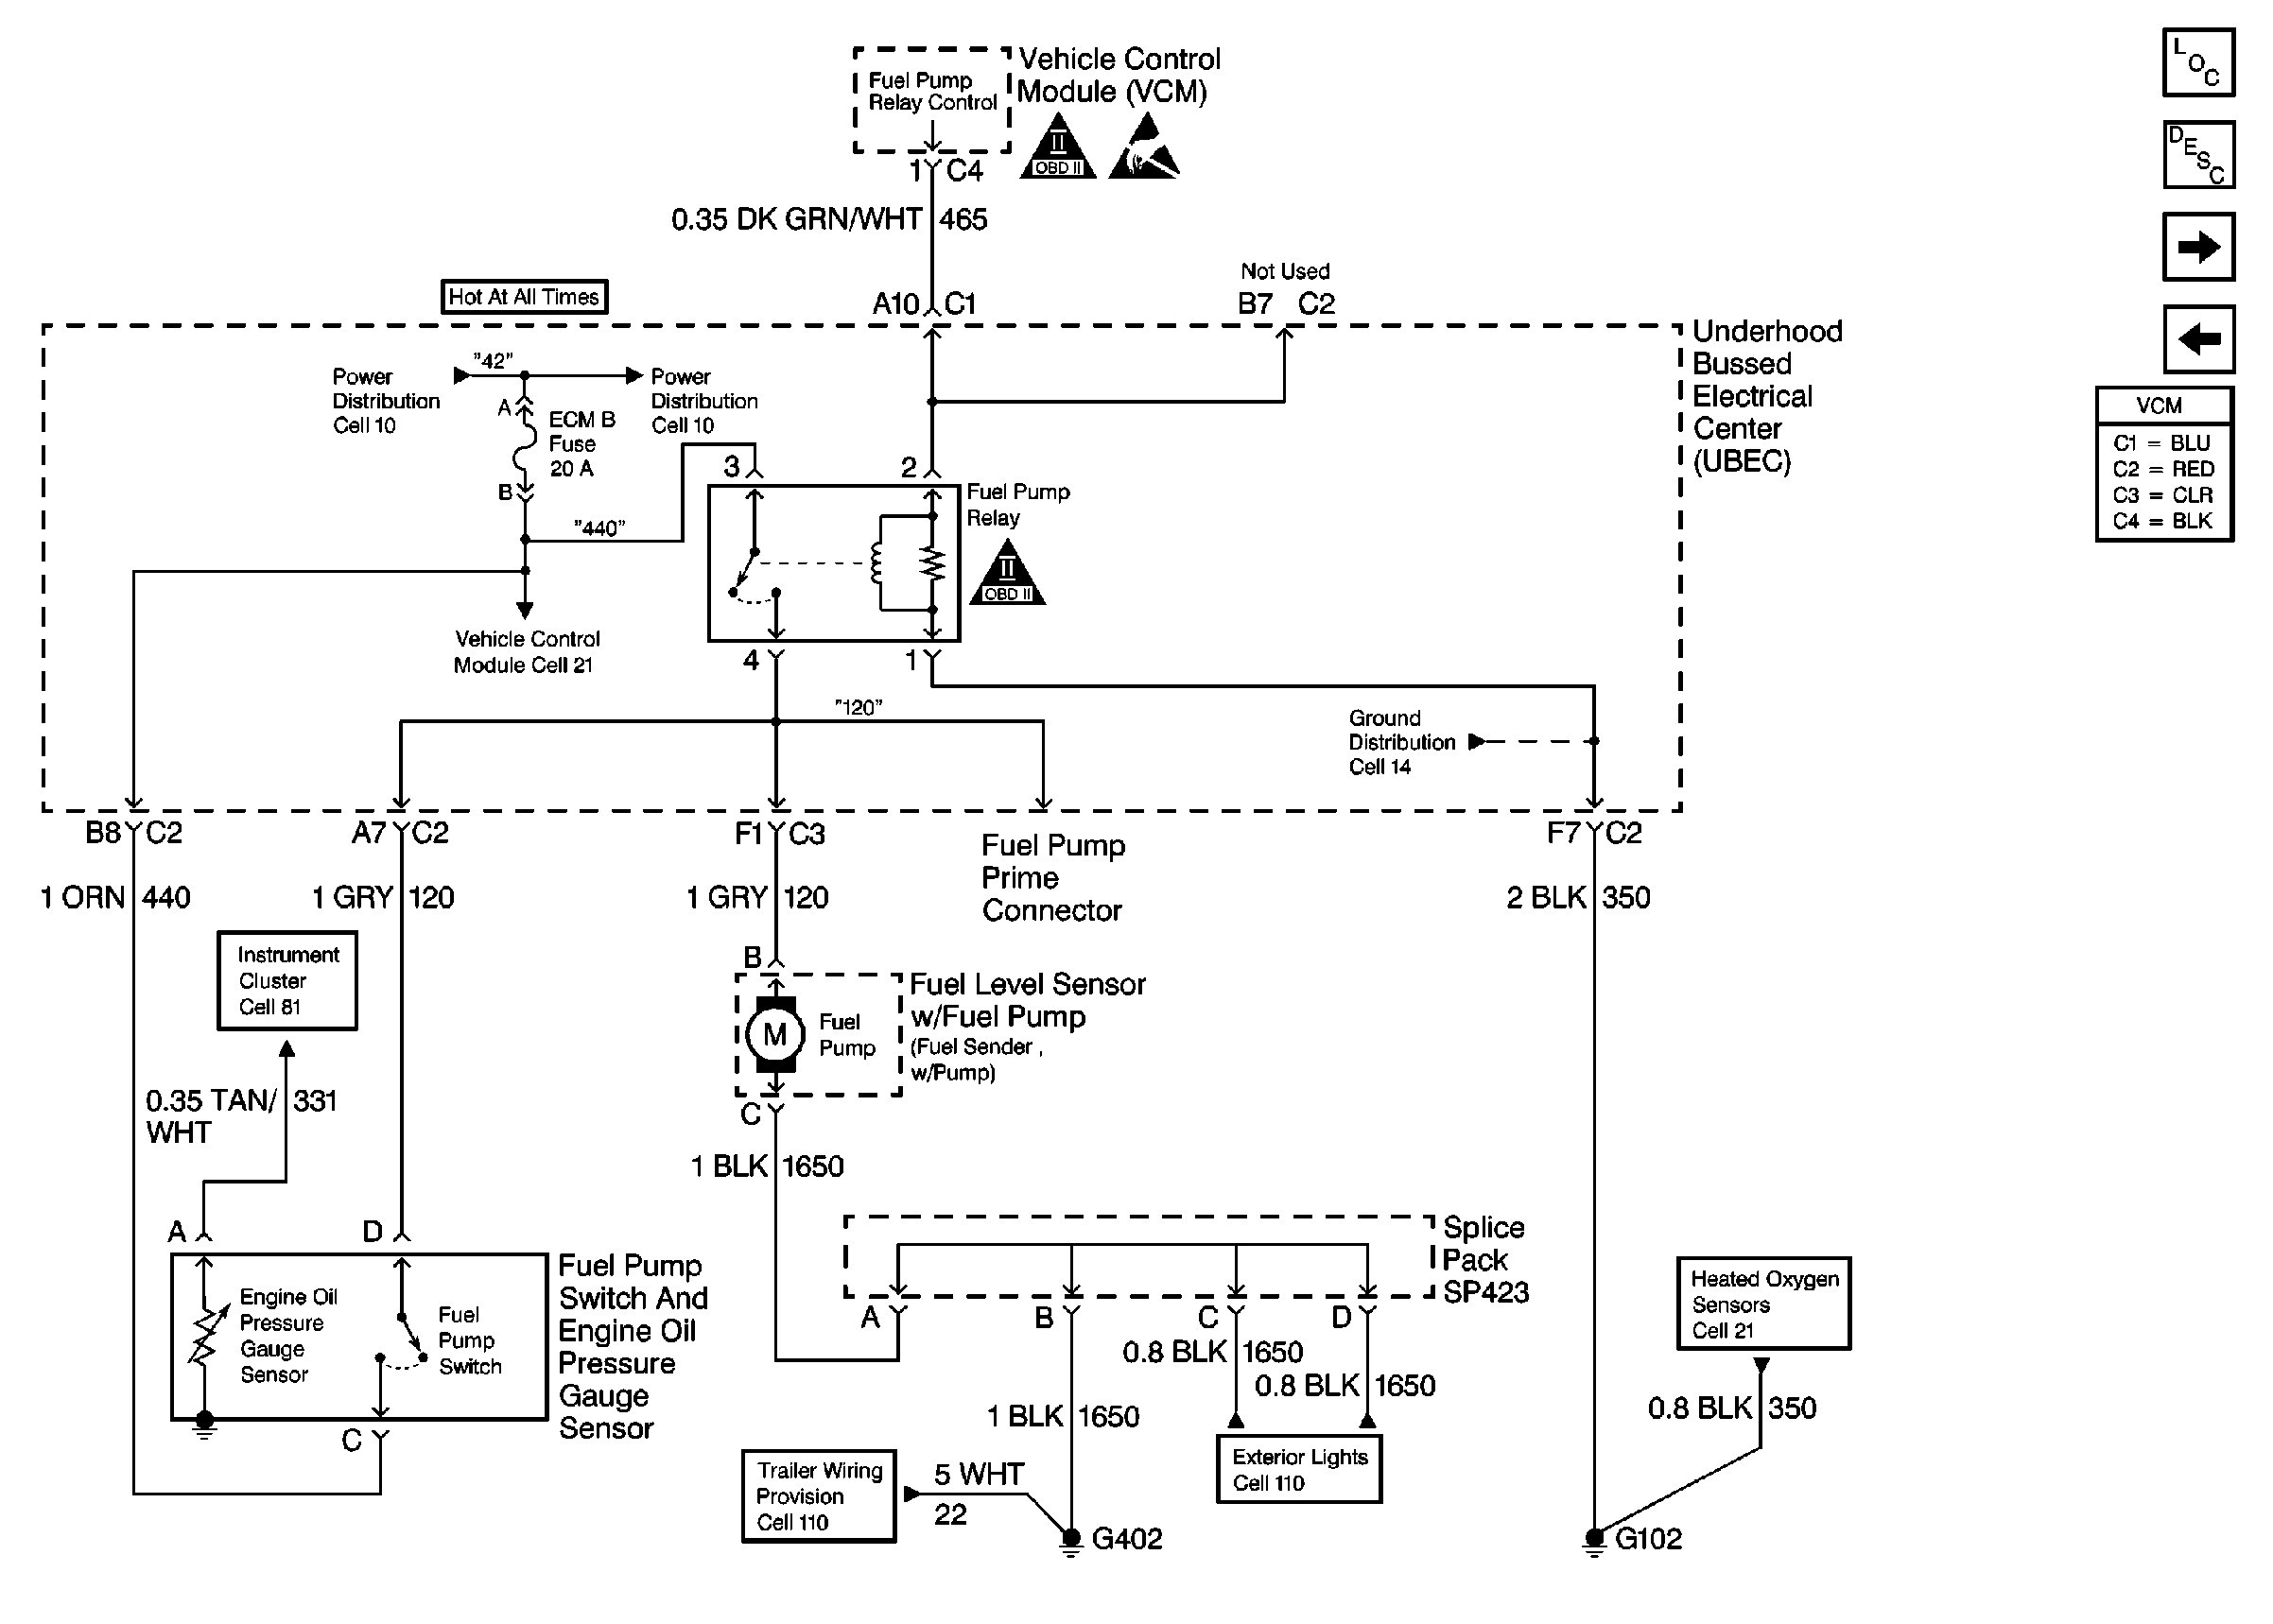 Ice Cube Relay Wiring Diagram | Wiring Diagram Image Ice Cube Pin Relay Wiring Diagram on